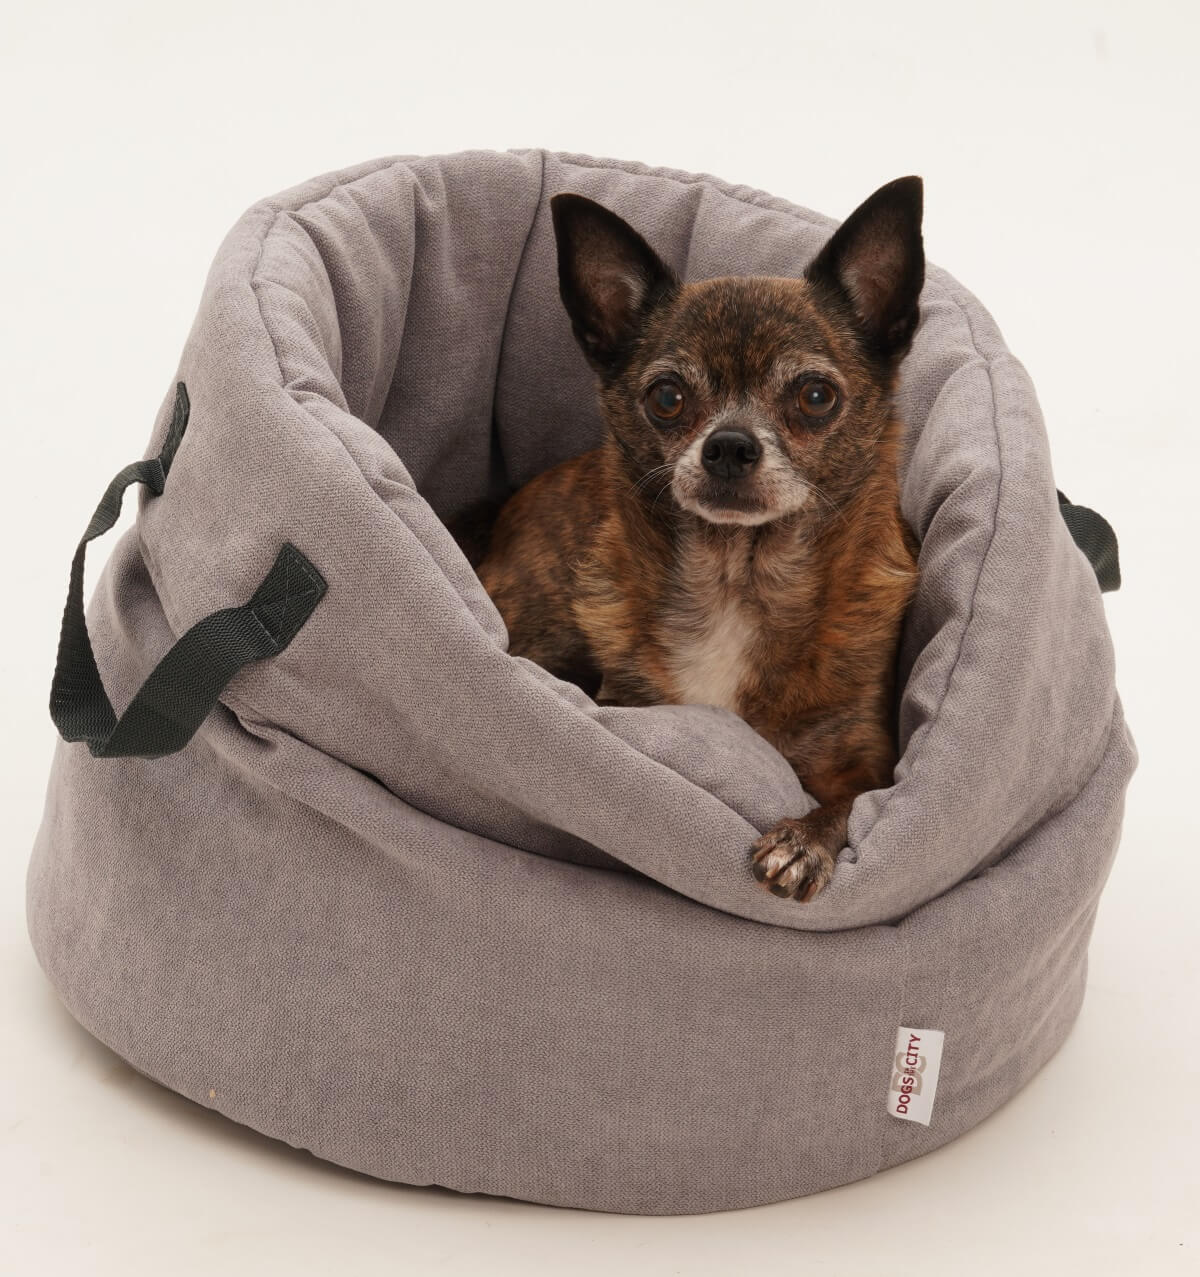 Full Size of Dogs In The City Hundekorb Shopper Little Basket Grau Regal Tiefe 30 Cm 50 Breit 20 Tief 40 Sofa Sitzhöhe 55 25 60 80 Hoch Bett Liegehöhe 120 Wohnzimmer Hundebett Flocke 125 Cm